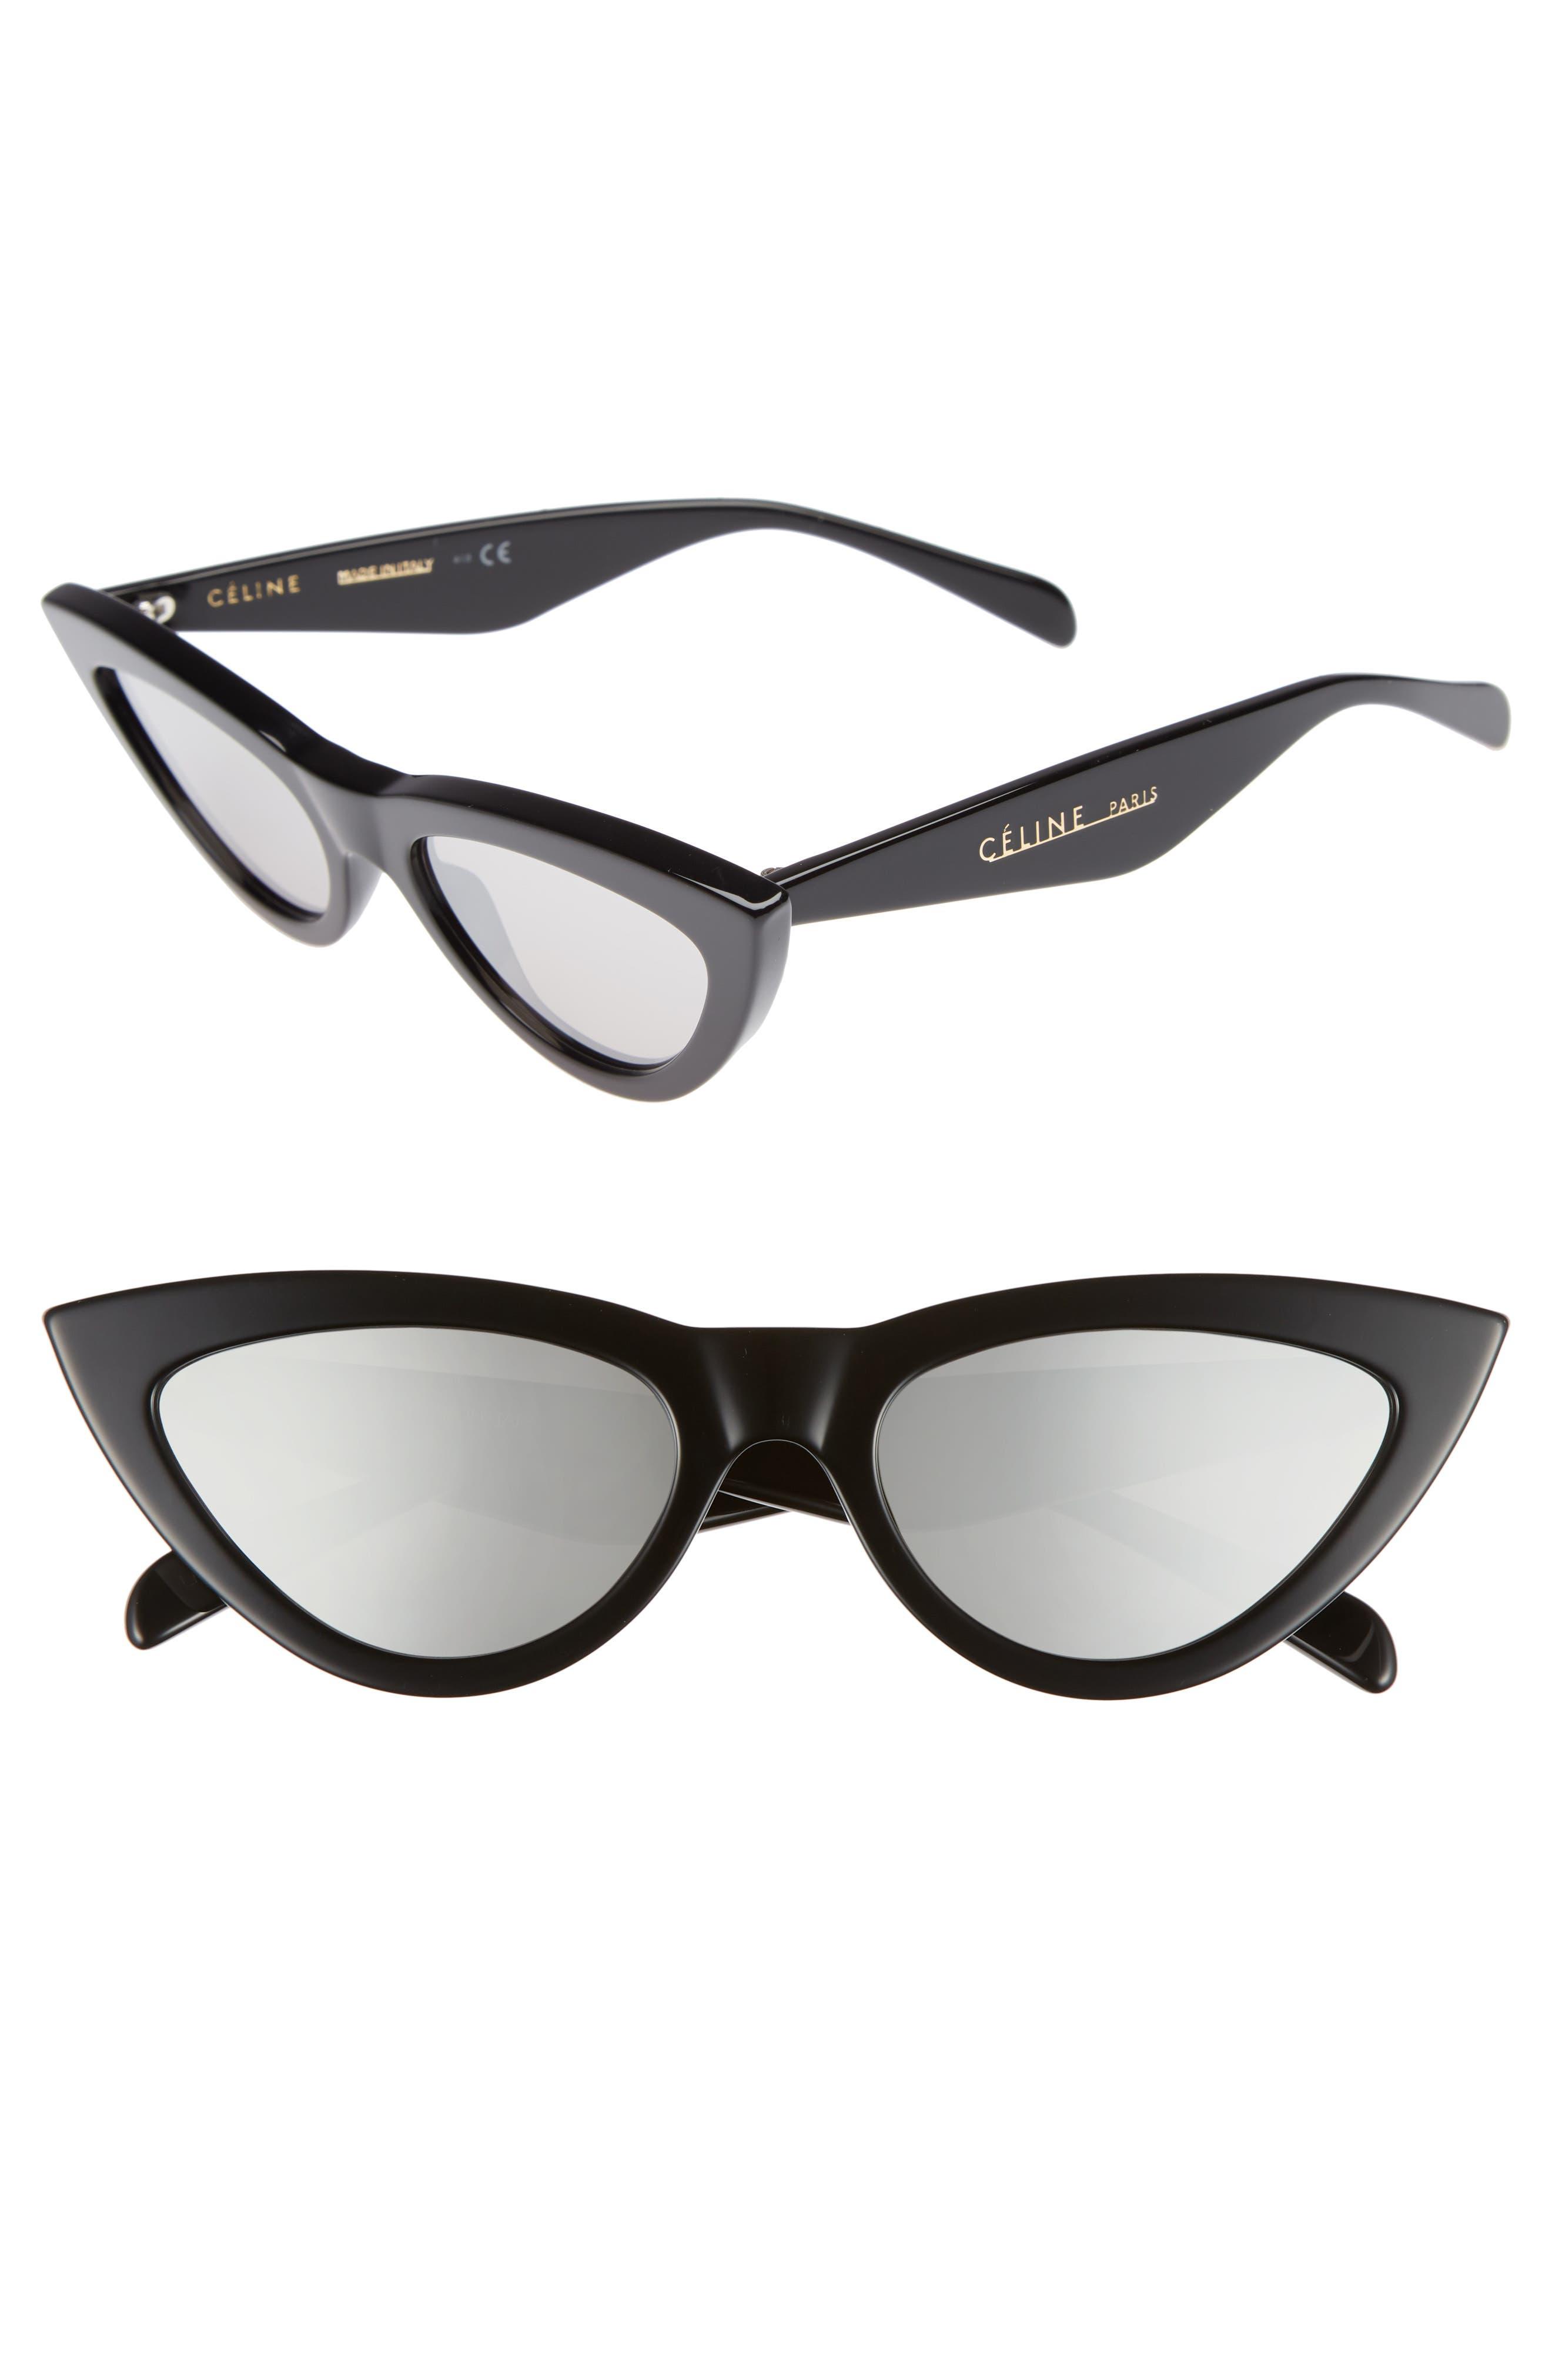 56mm Cat Eye Sunglasses,                             Main thumbnail 1, color,                             BLACK/ SILVER FLASH